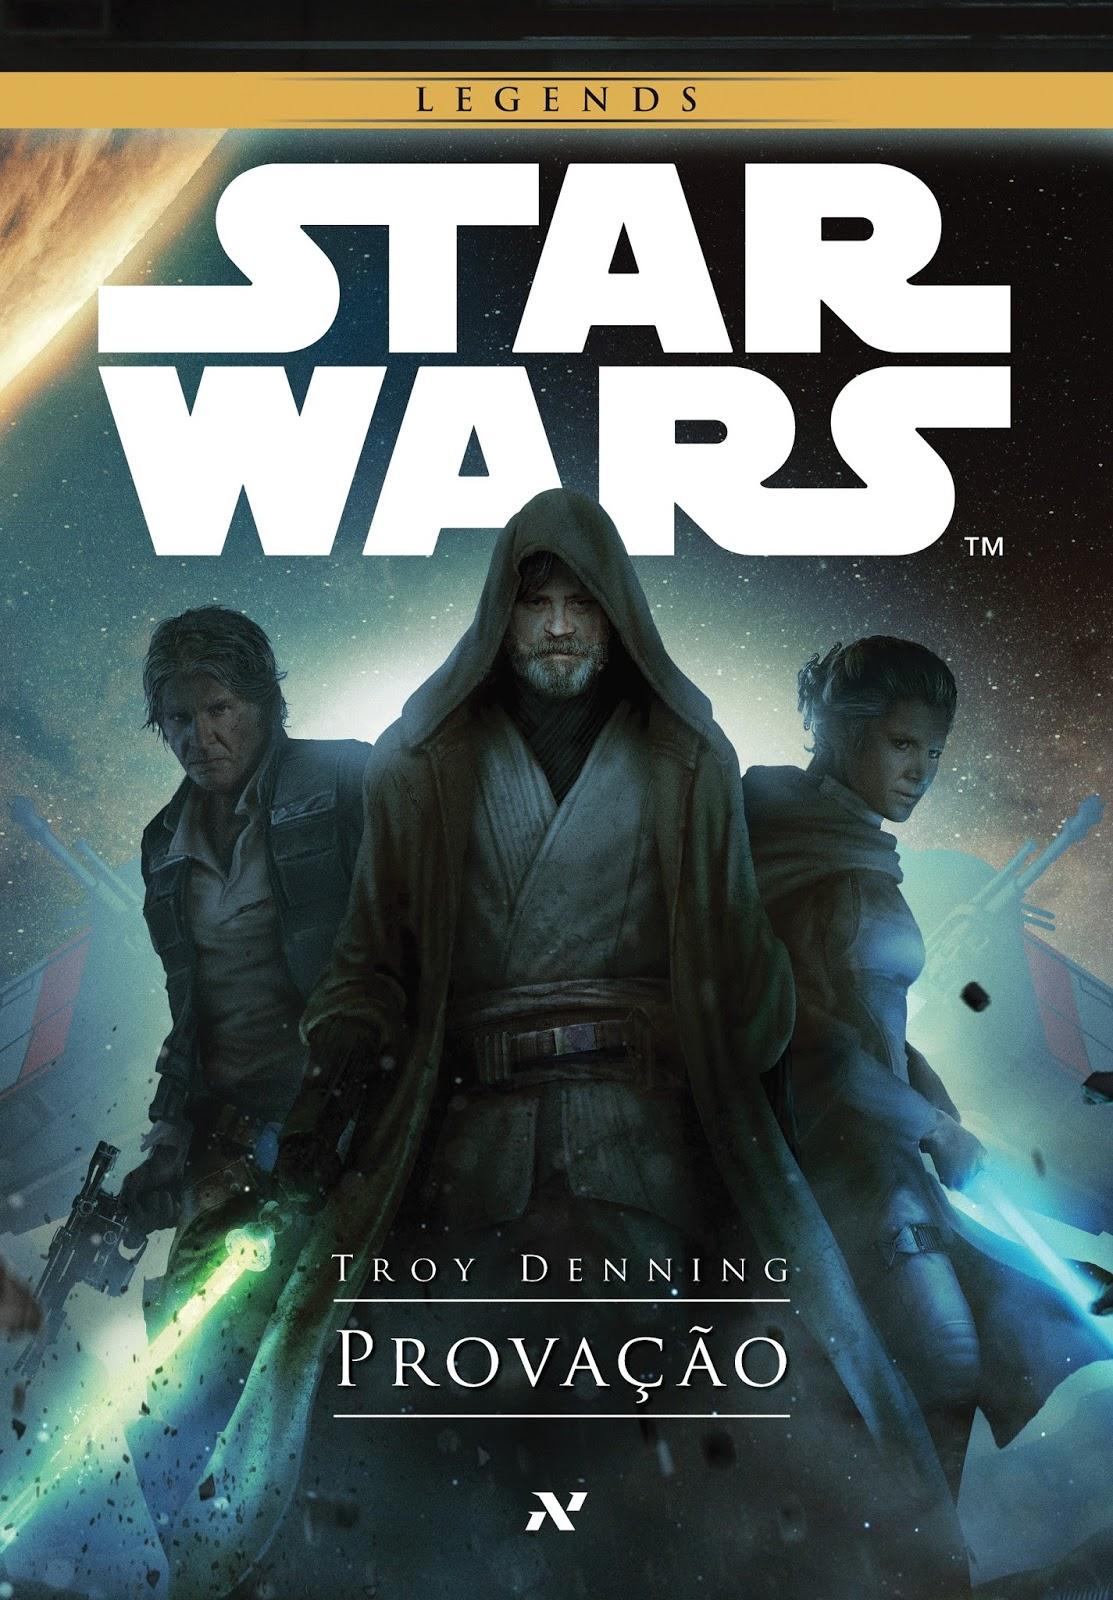 Star Wars Book Cover Art : The geeky nerfherder coolart star wars book cover art